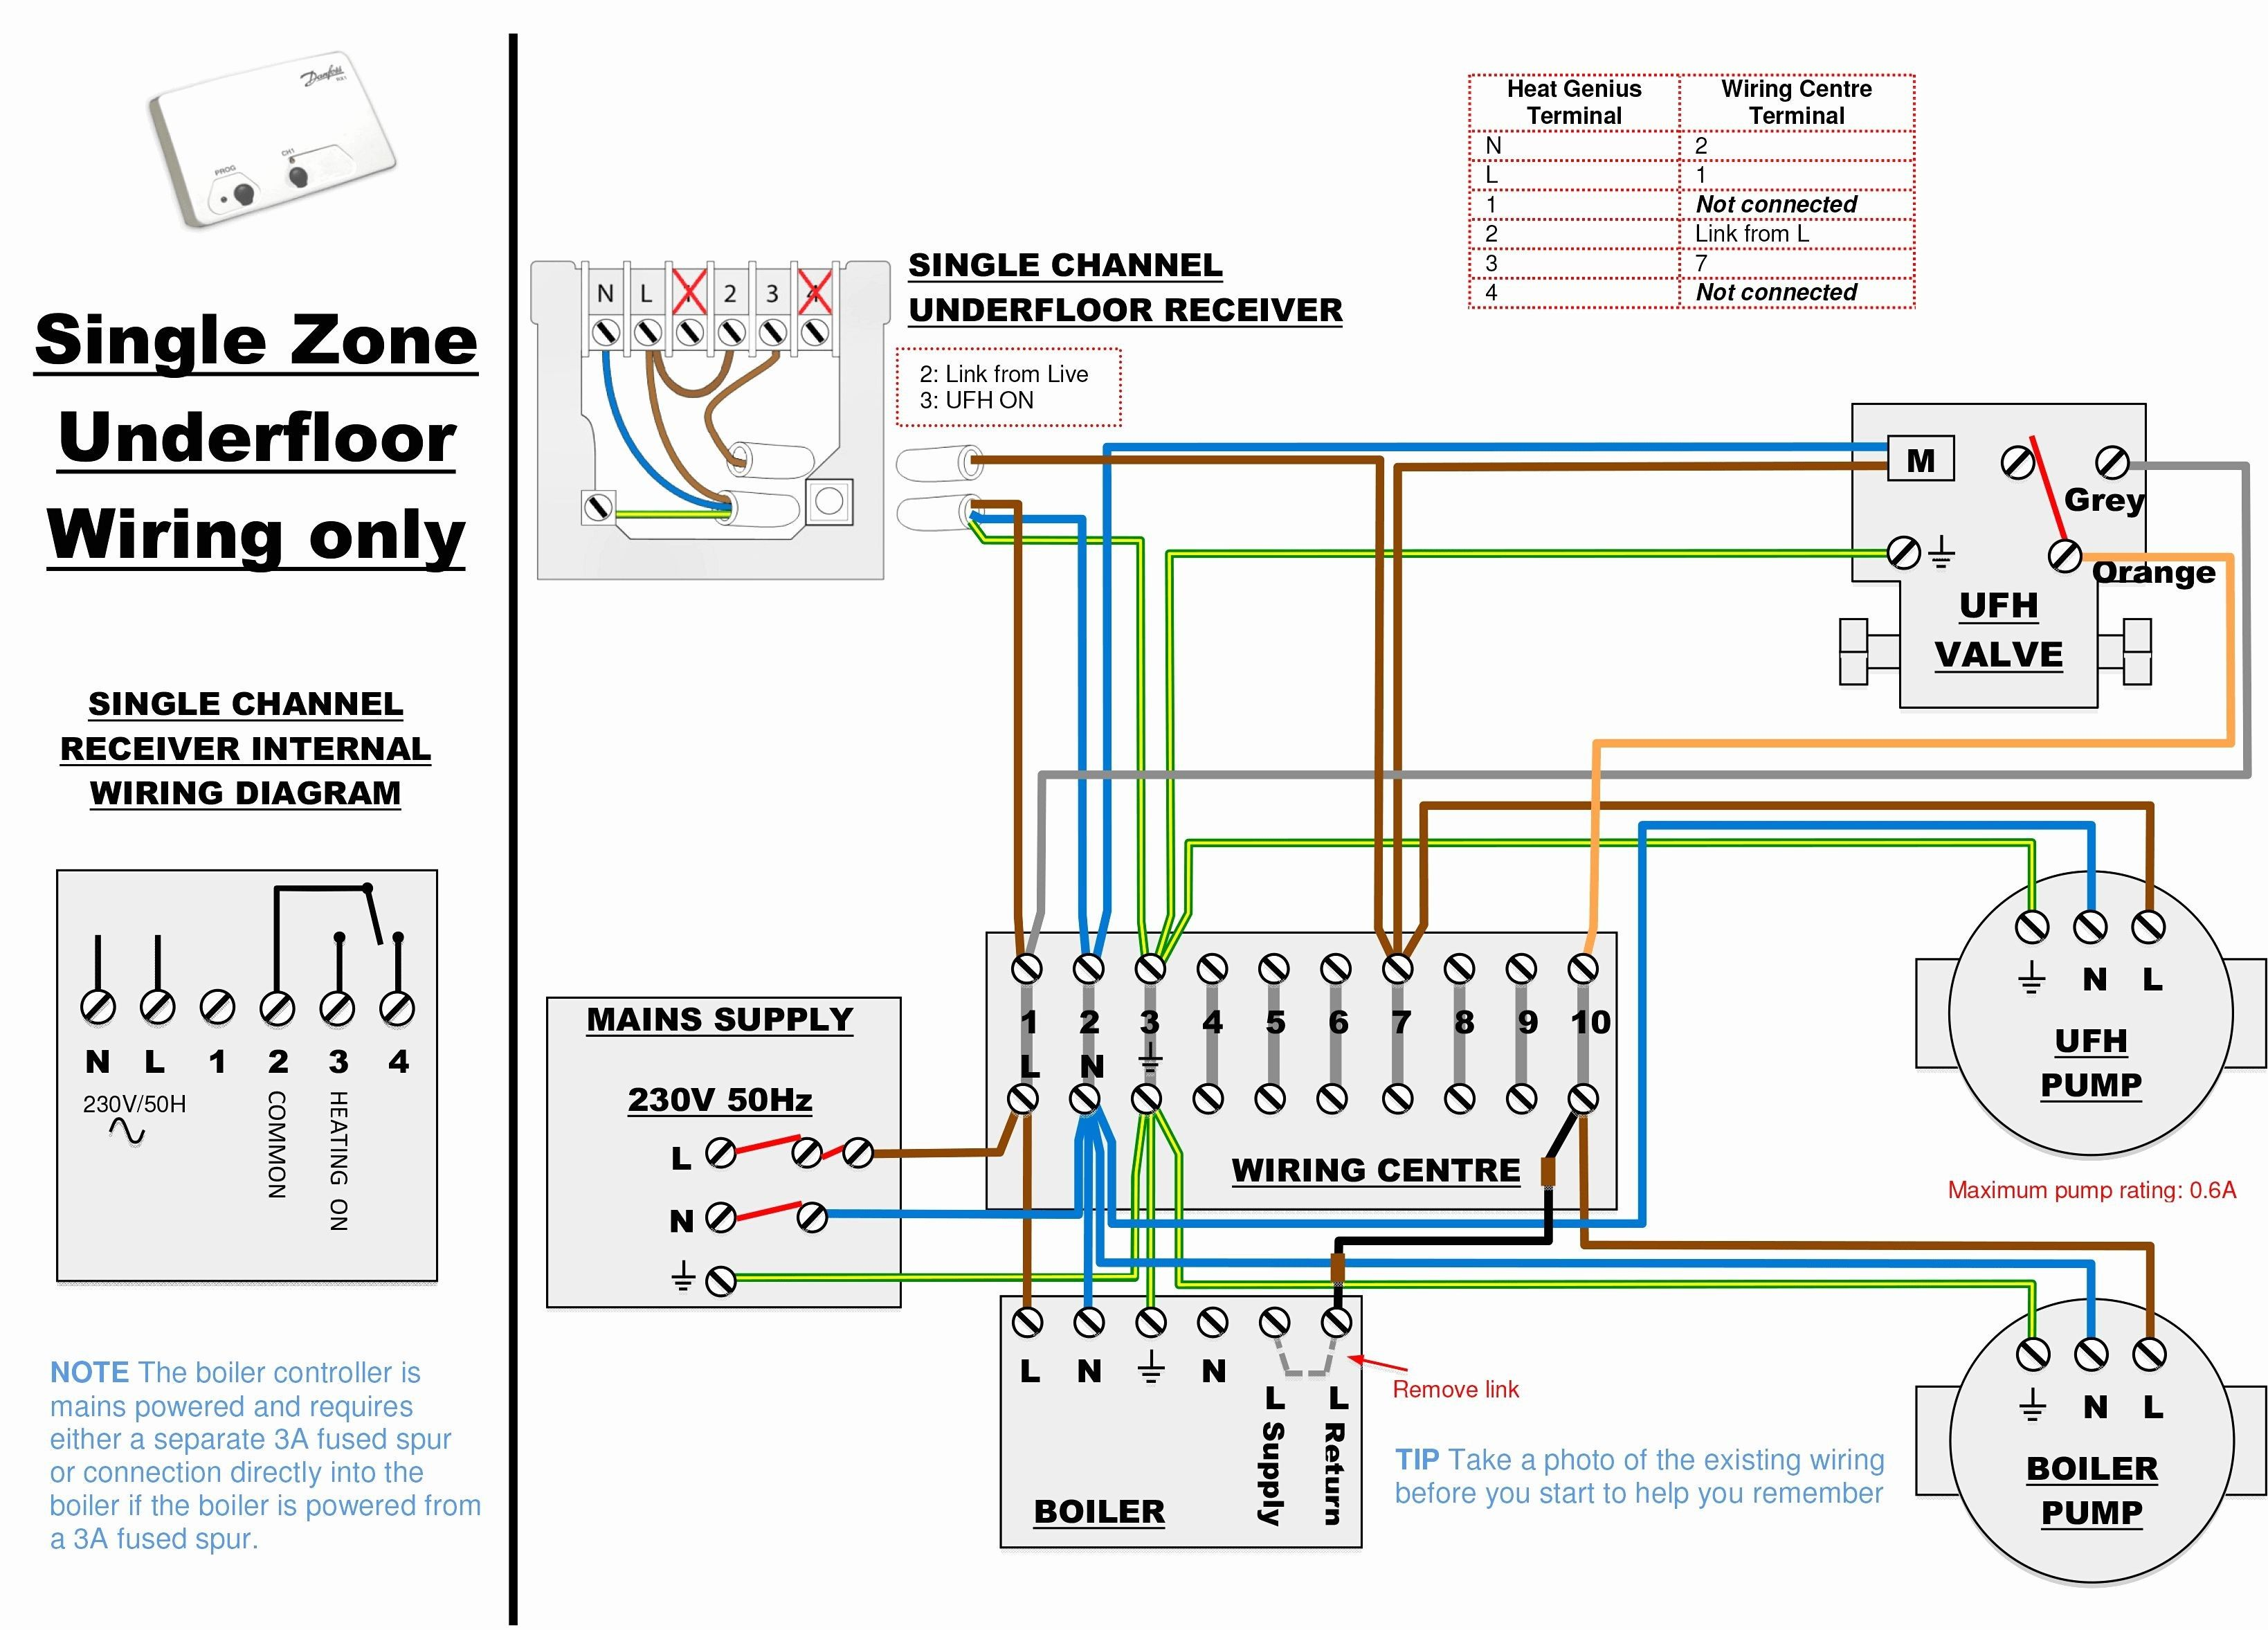 Electric Boiler Control Wiring Diagram